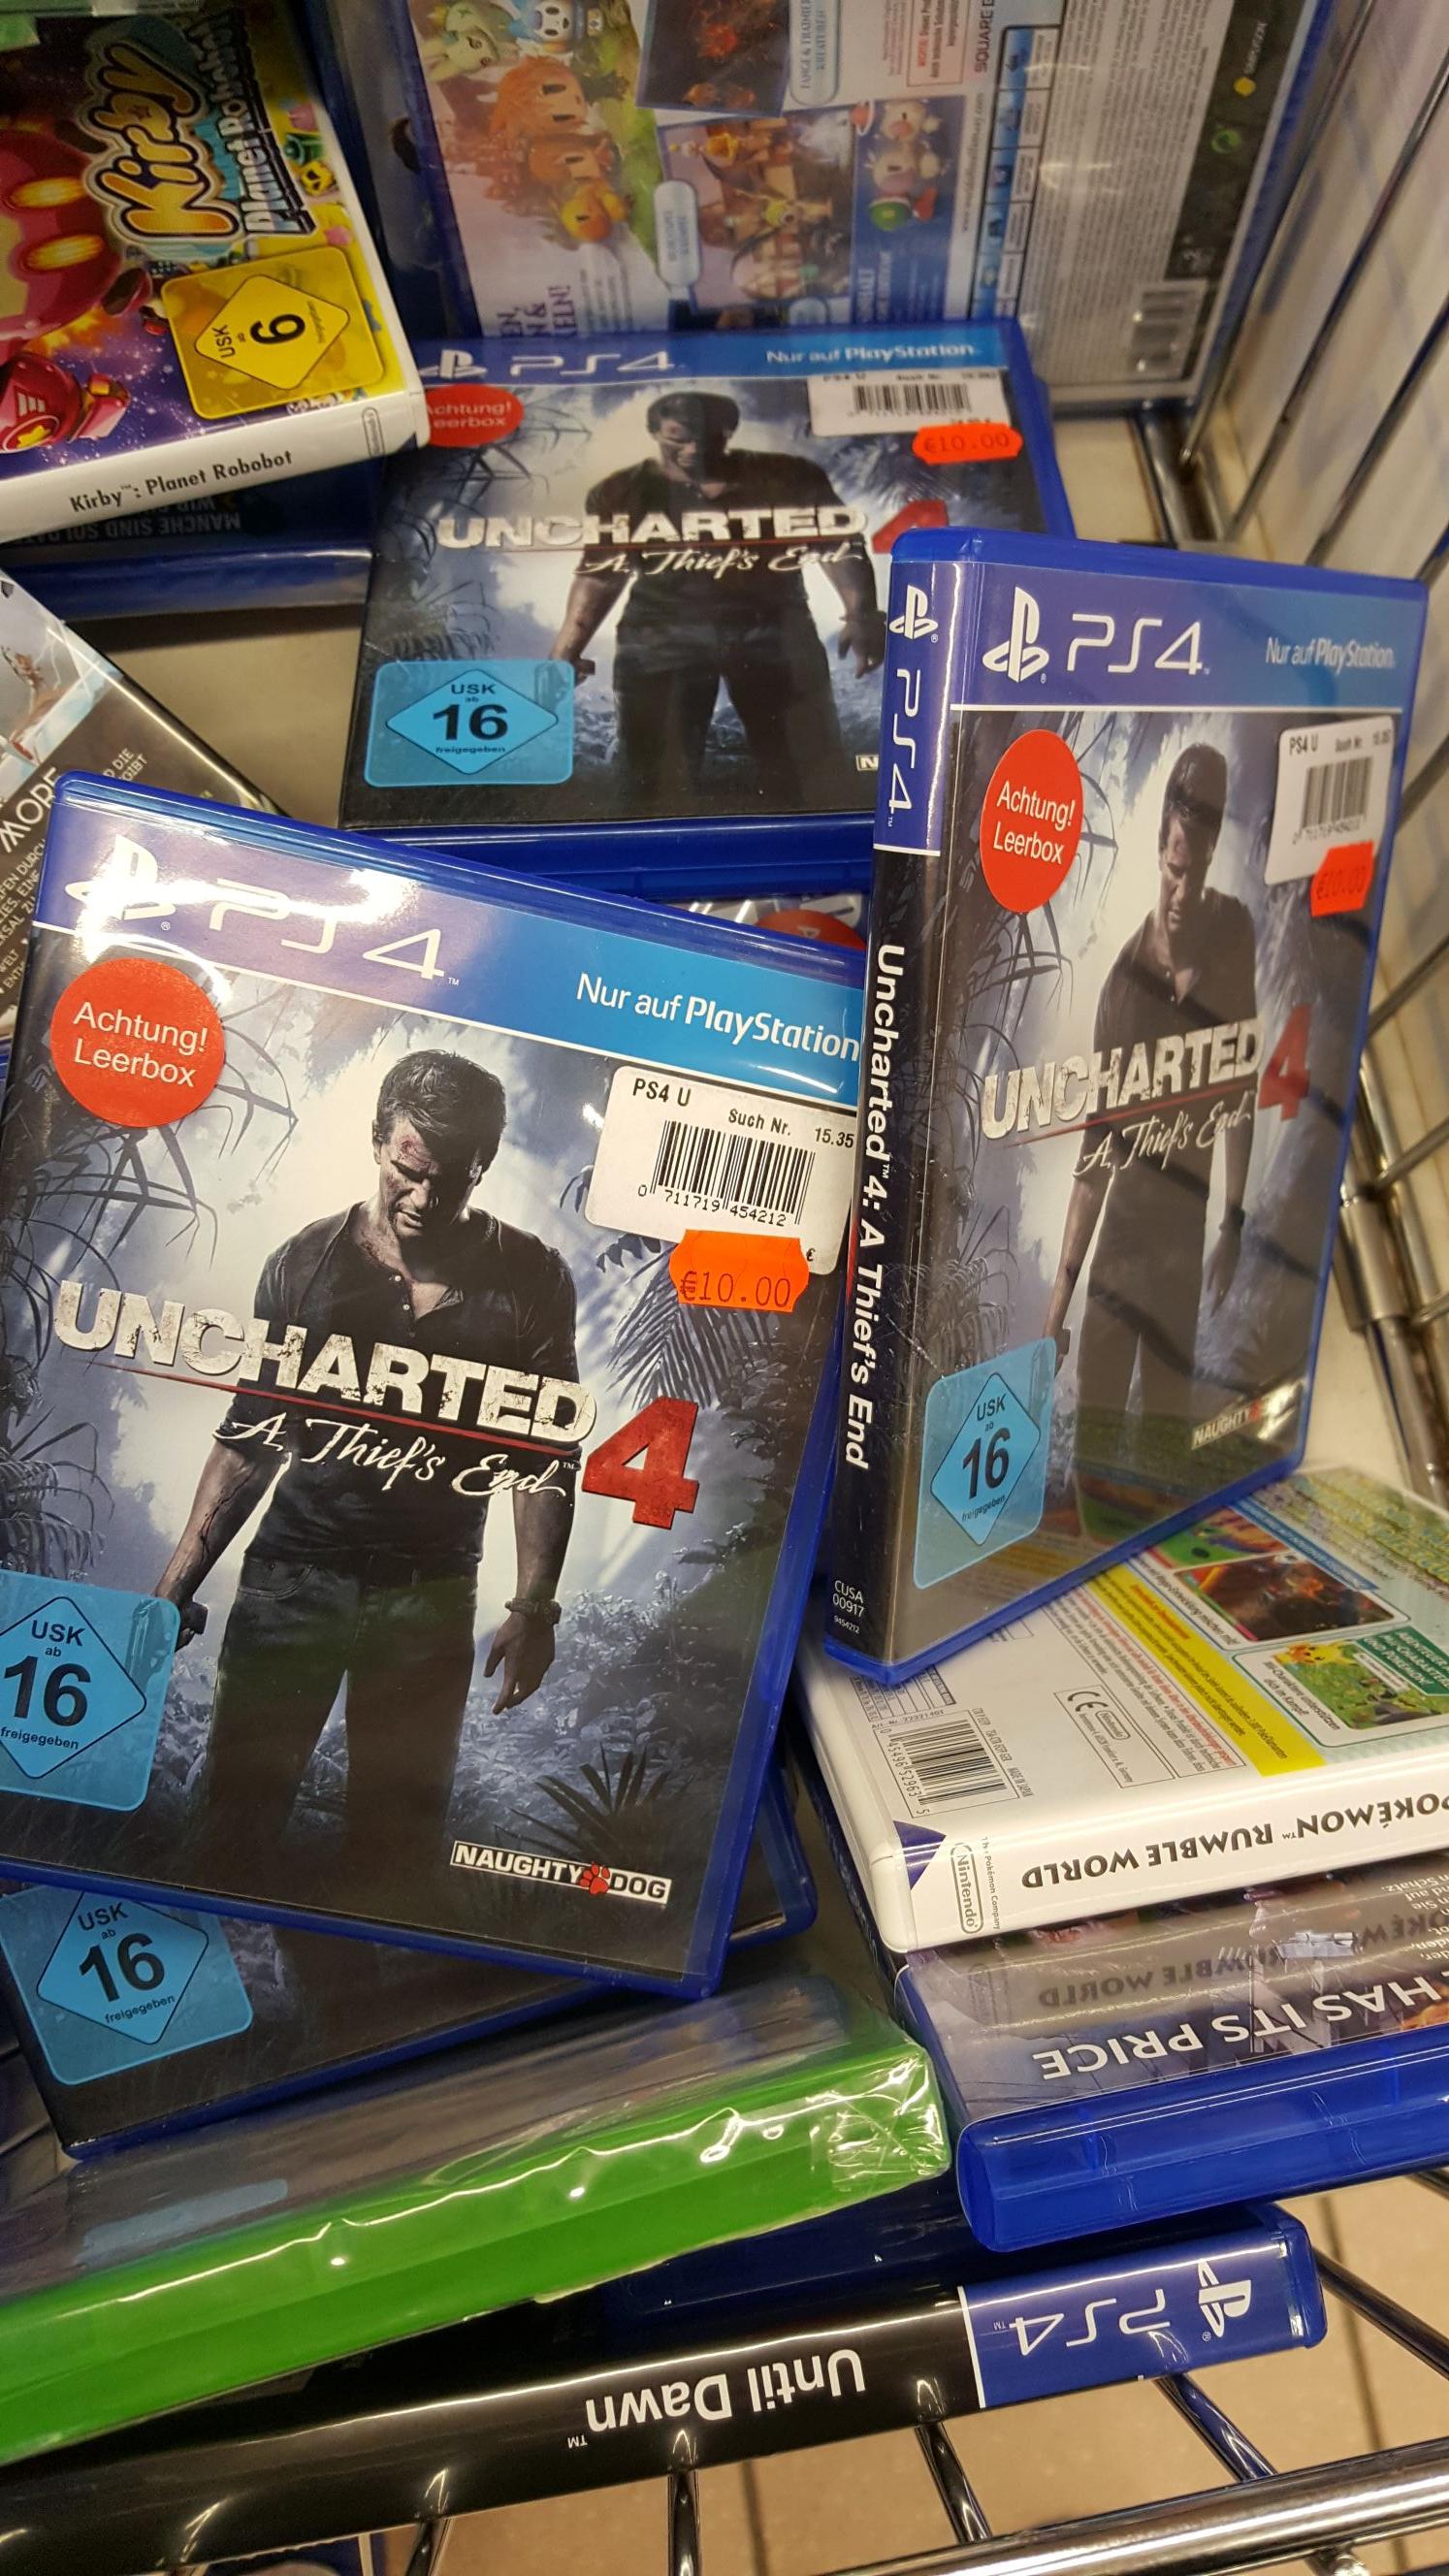 Lokal Real Ettlingen: Uncharted 4 PS4, No Man's Sky PS4